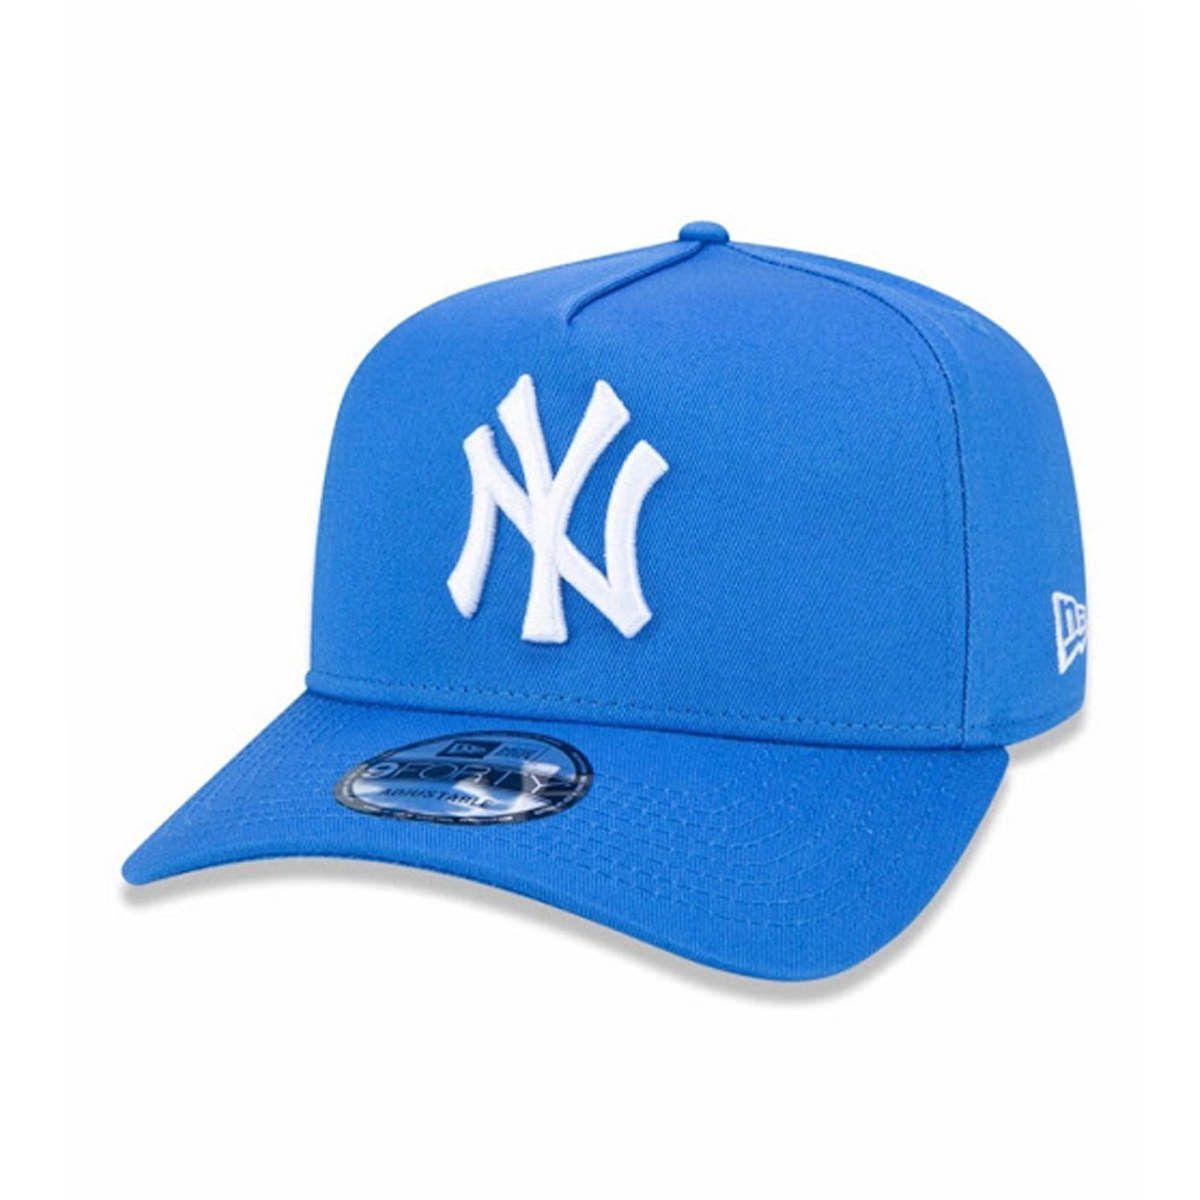 Boné New Era Masculino Yankees Azul